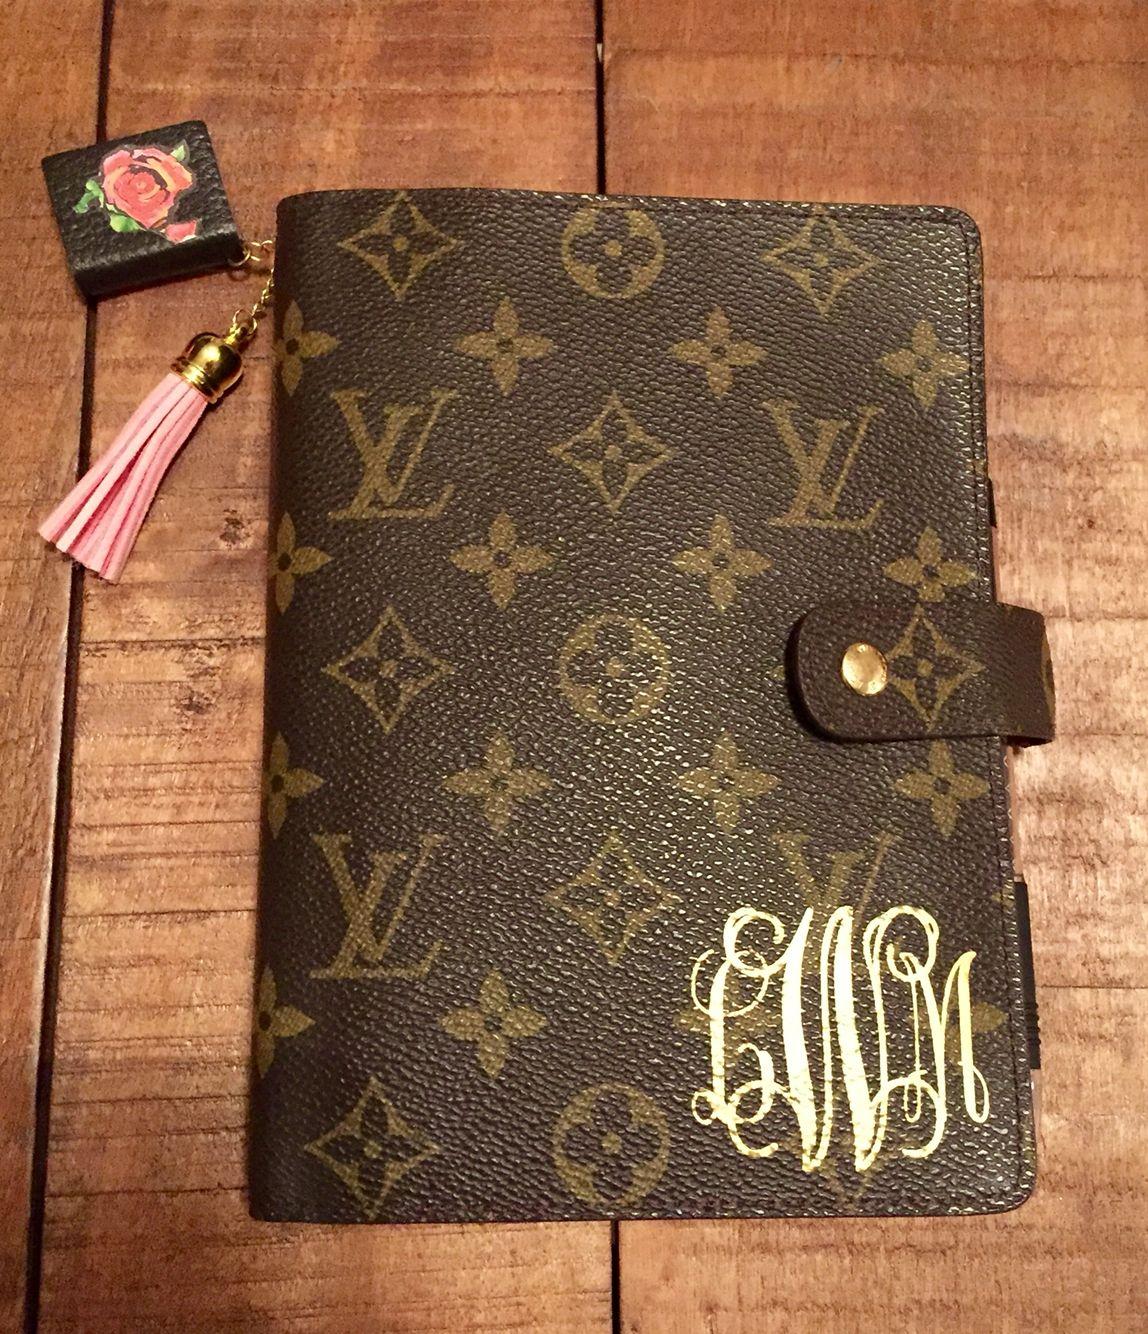 Gorgeous Louis Vuitton Neverfull Mm Monogram Handbag Barely Used Louis Vuitton Handbags Neverfull Louis Vuitton Handbags Louis Vuitton